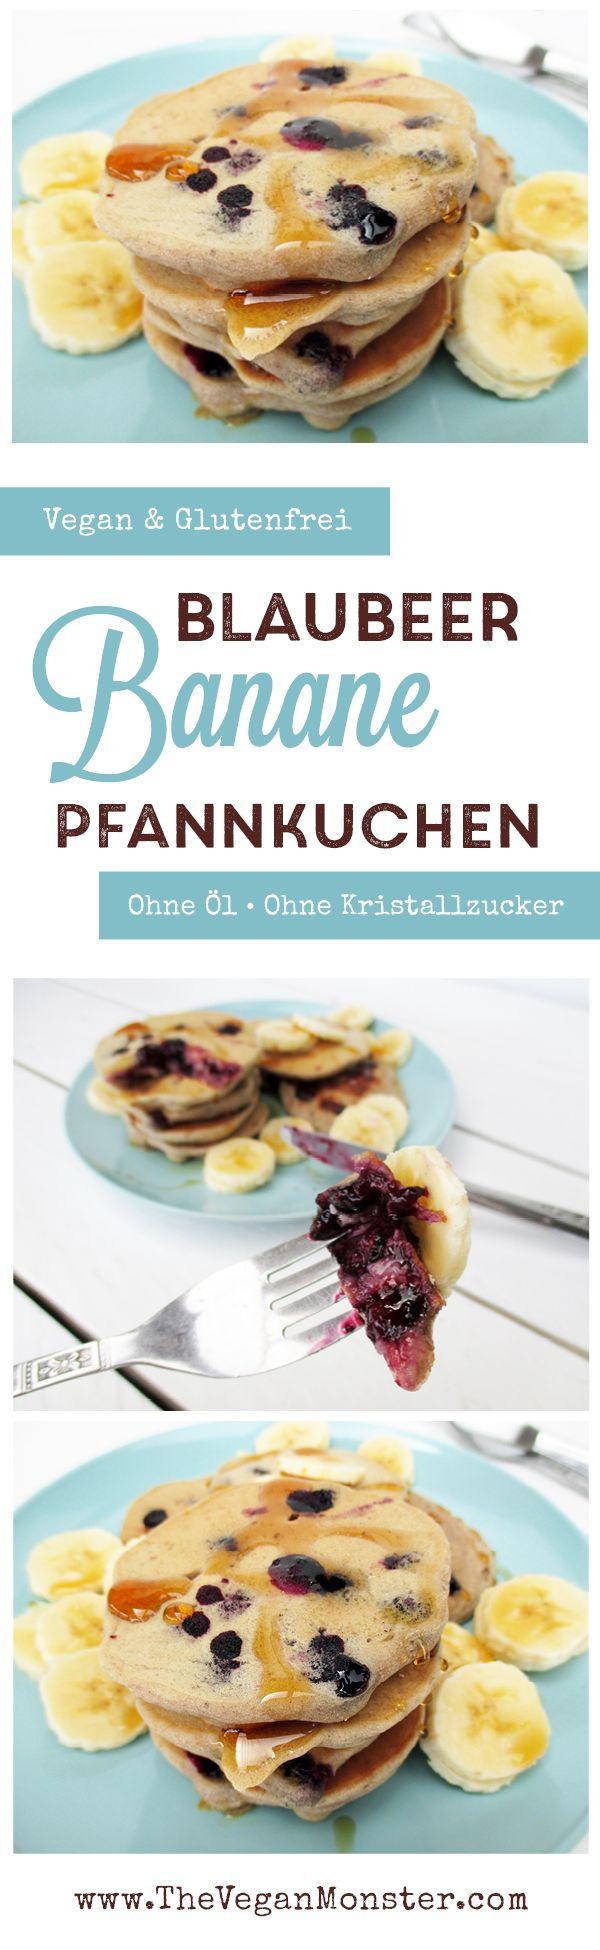 25 best ideas about bananen pfannkuchen on pinterest. Black Bedroom Furniture Sets. Home Design Ideas